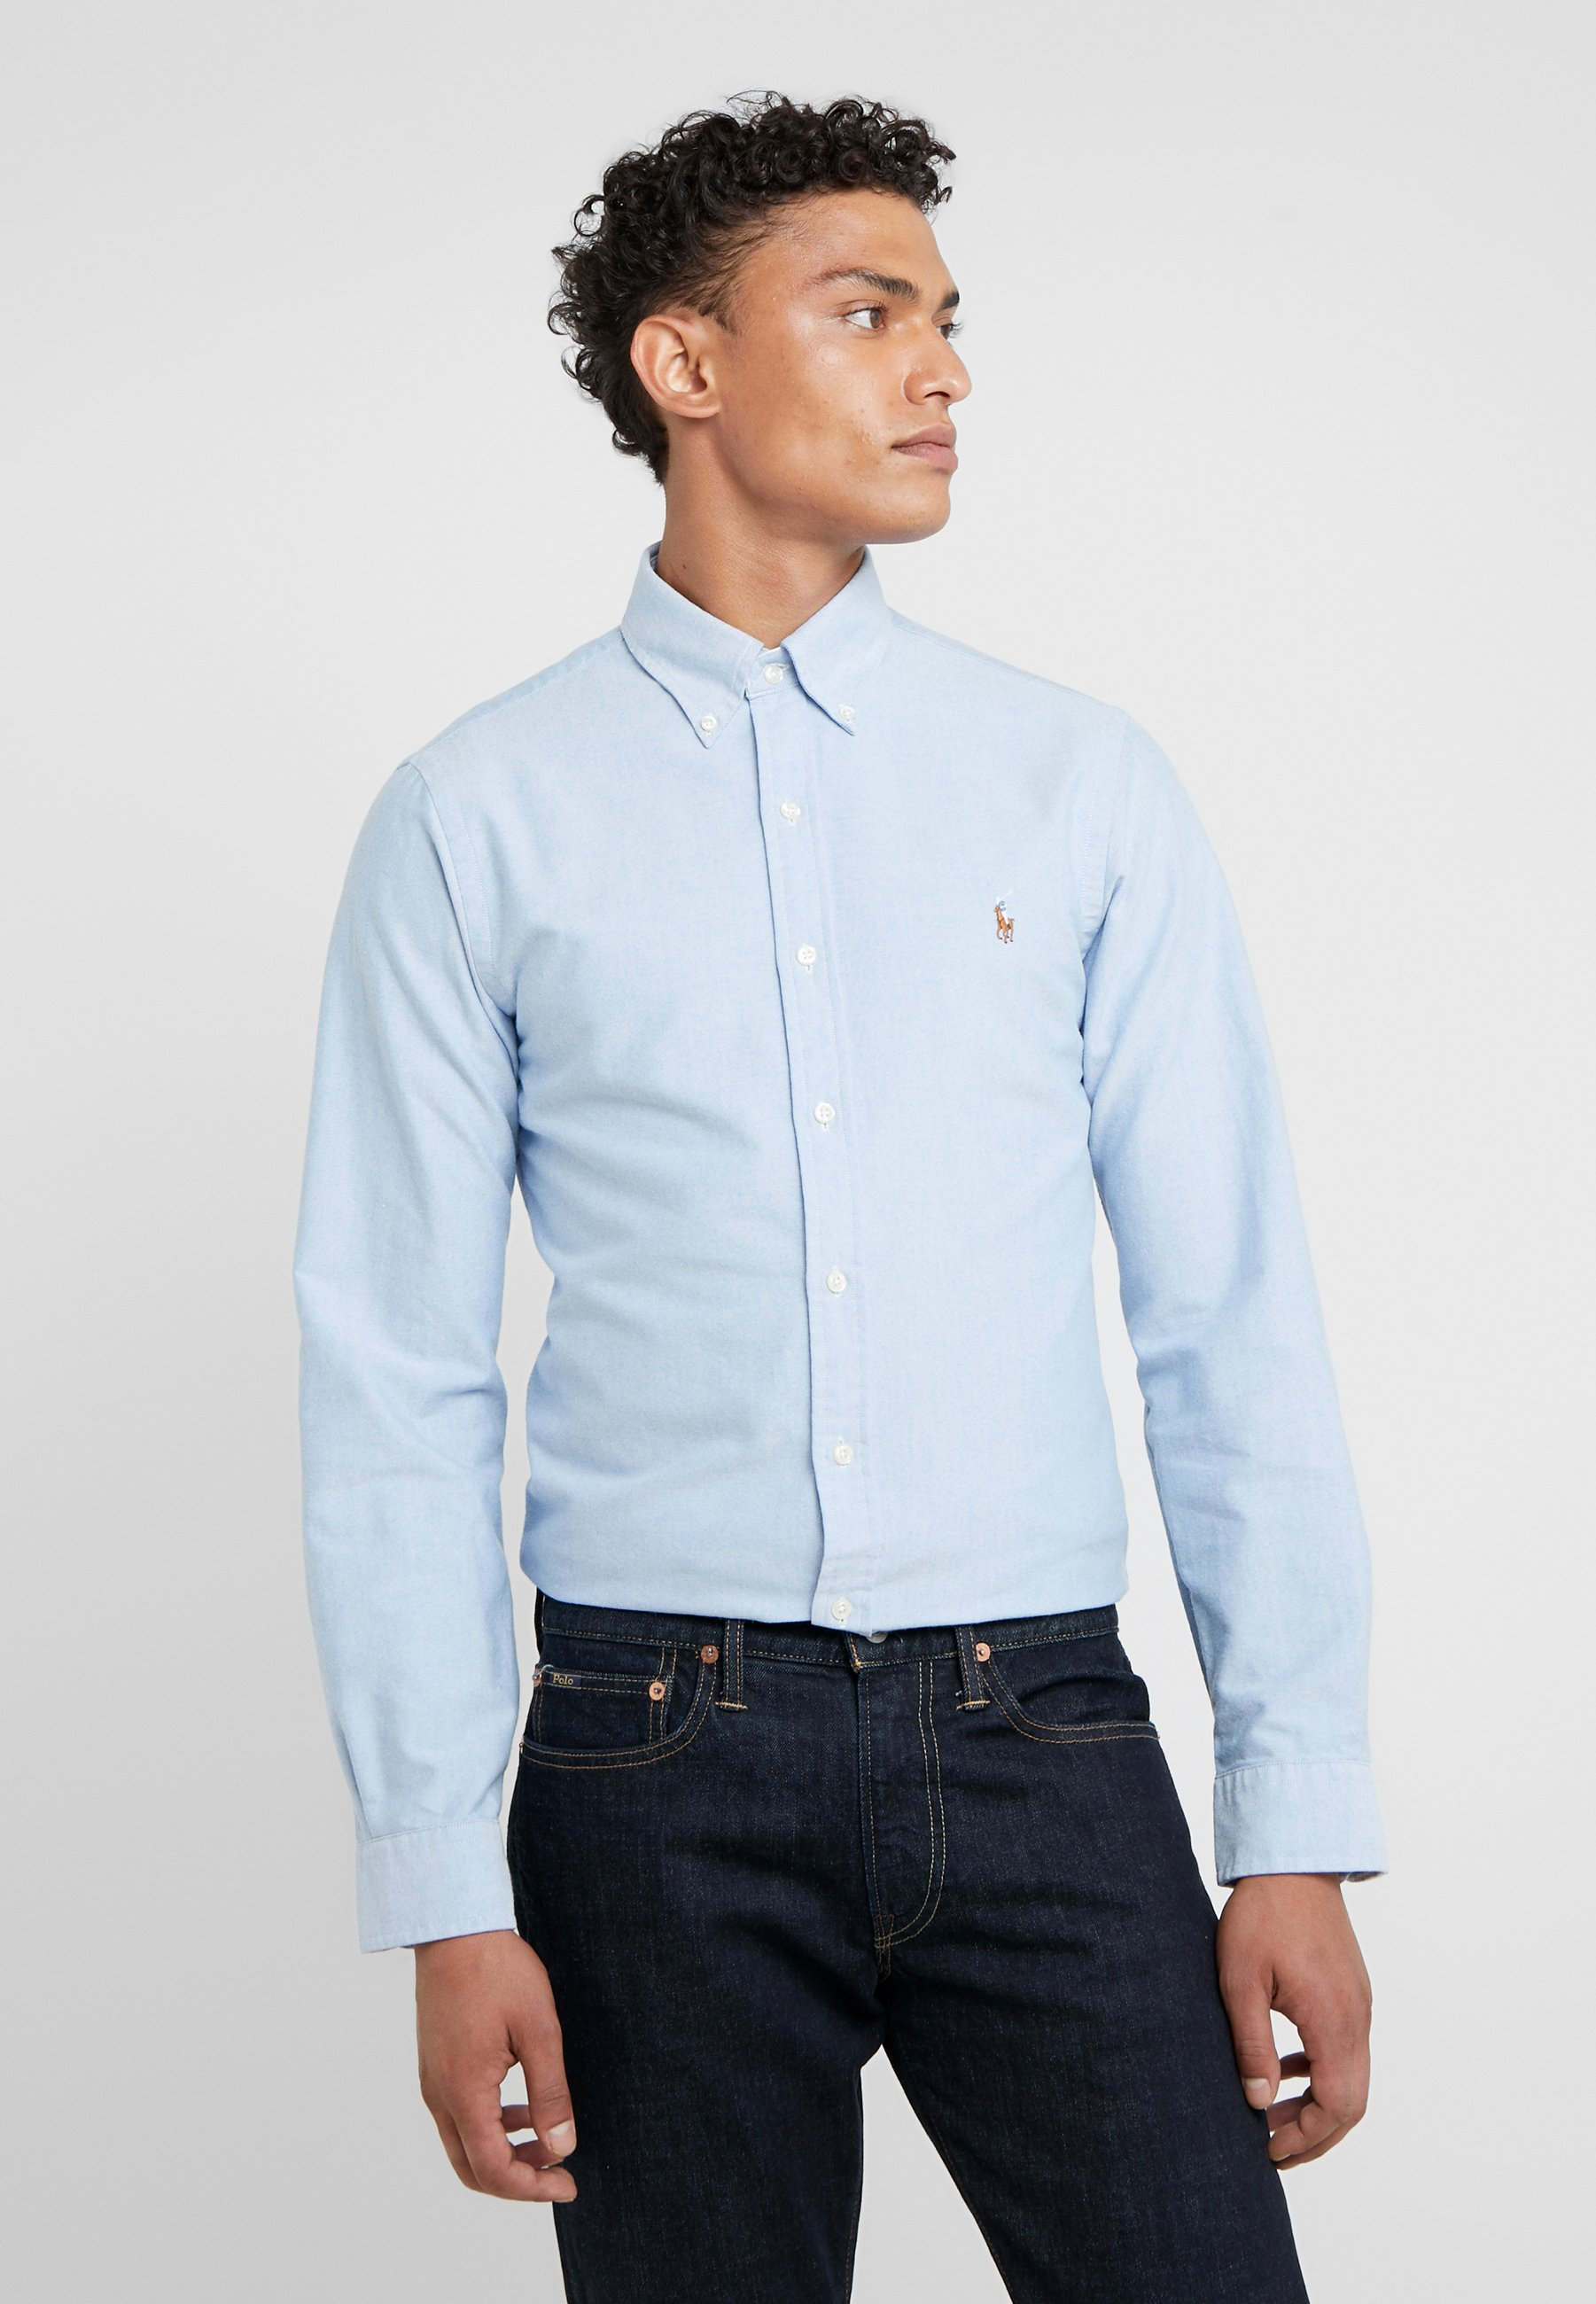 Herren SLIM FIT OXFORD SHIRT - Hemd